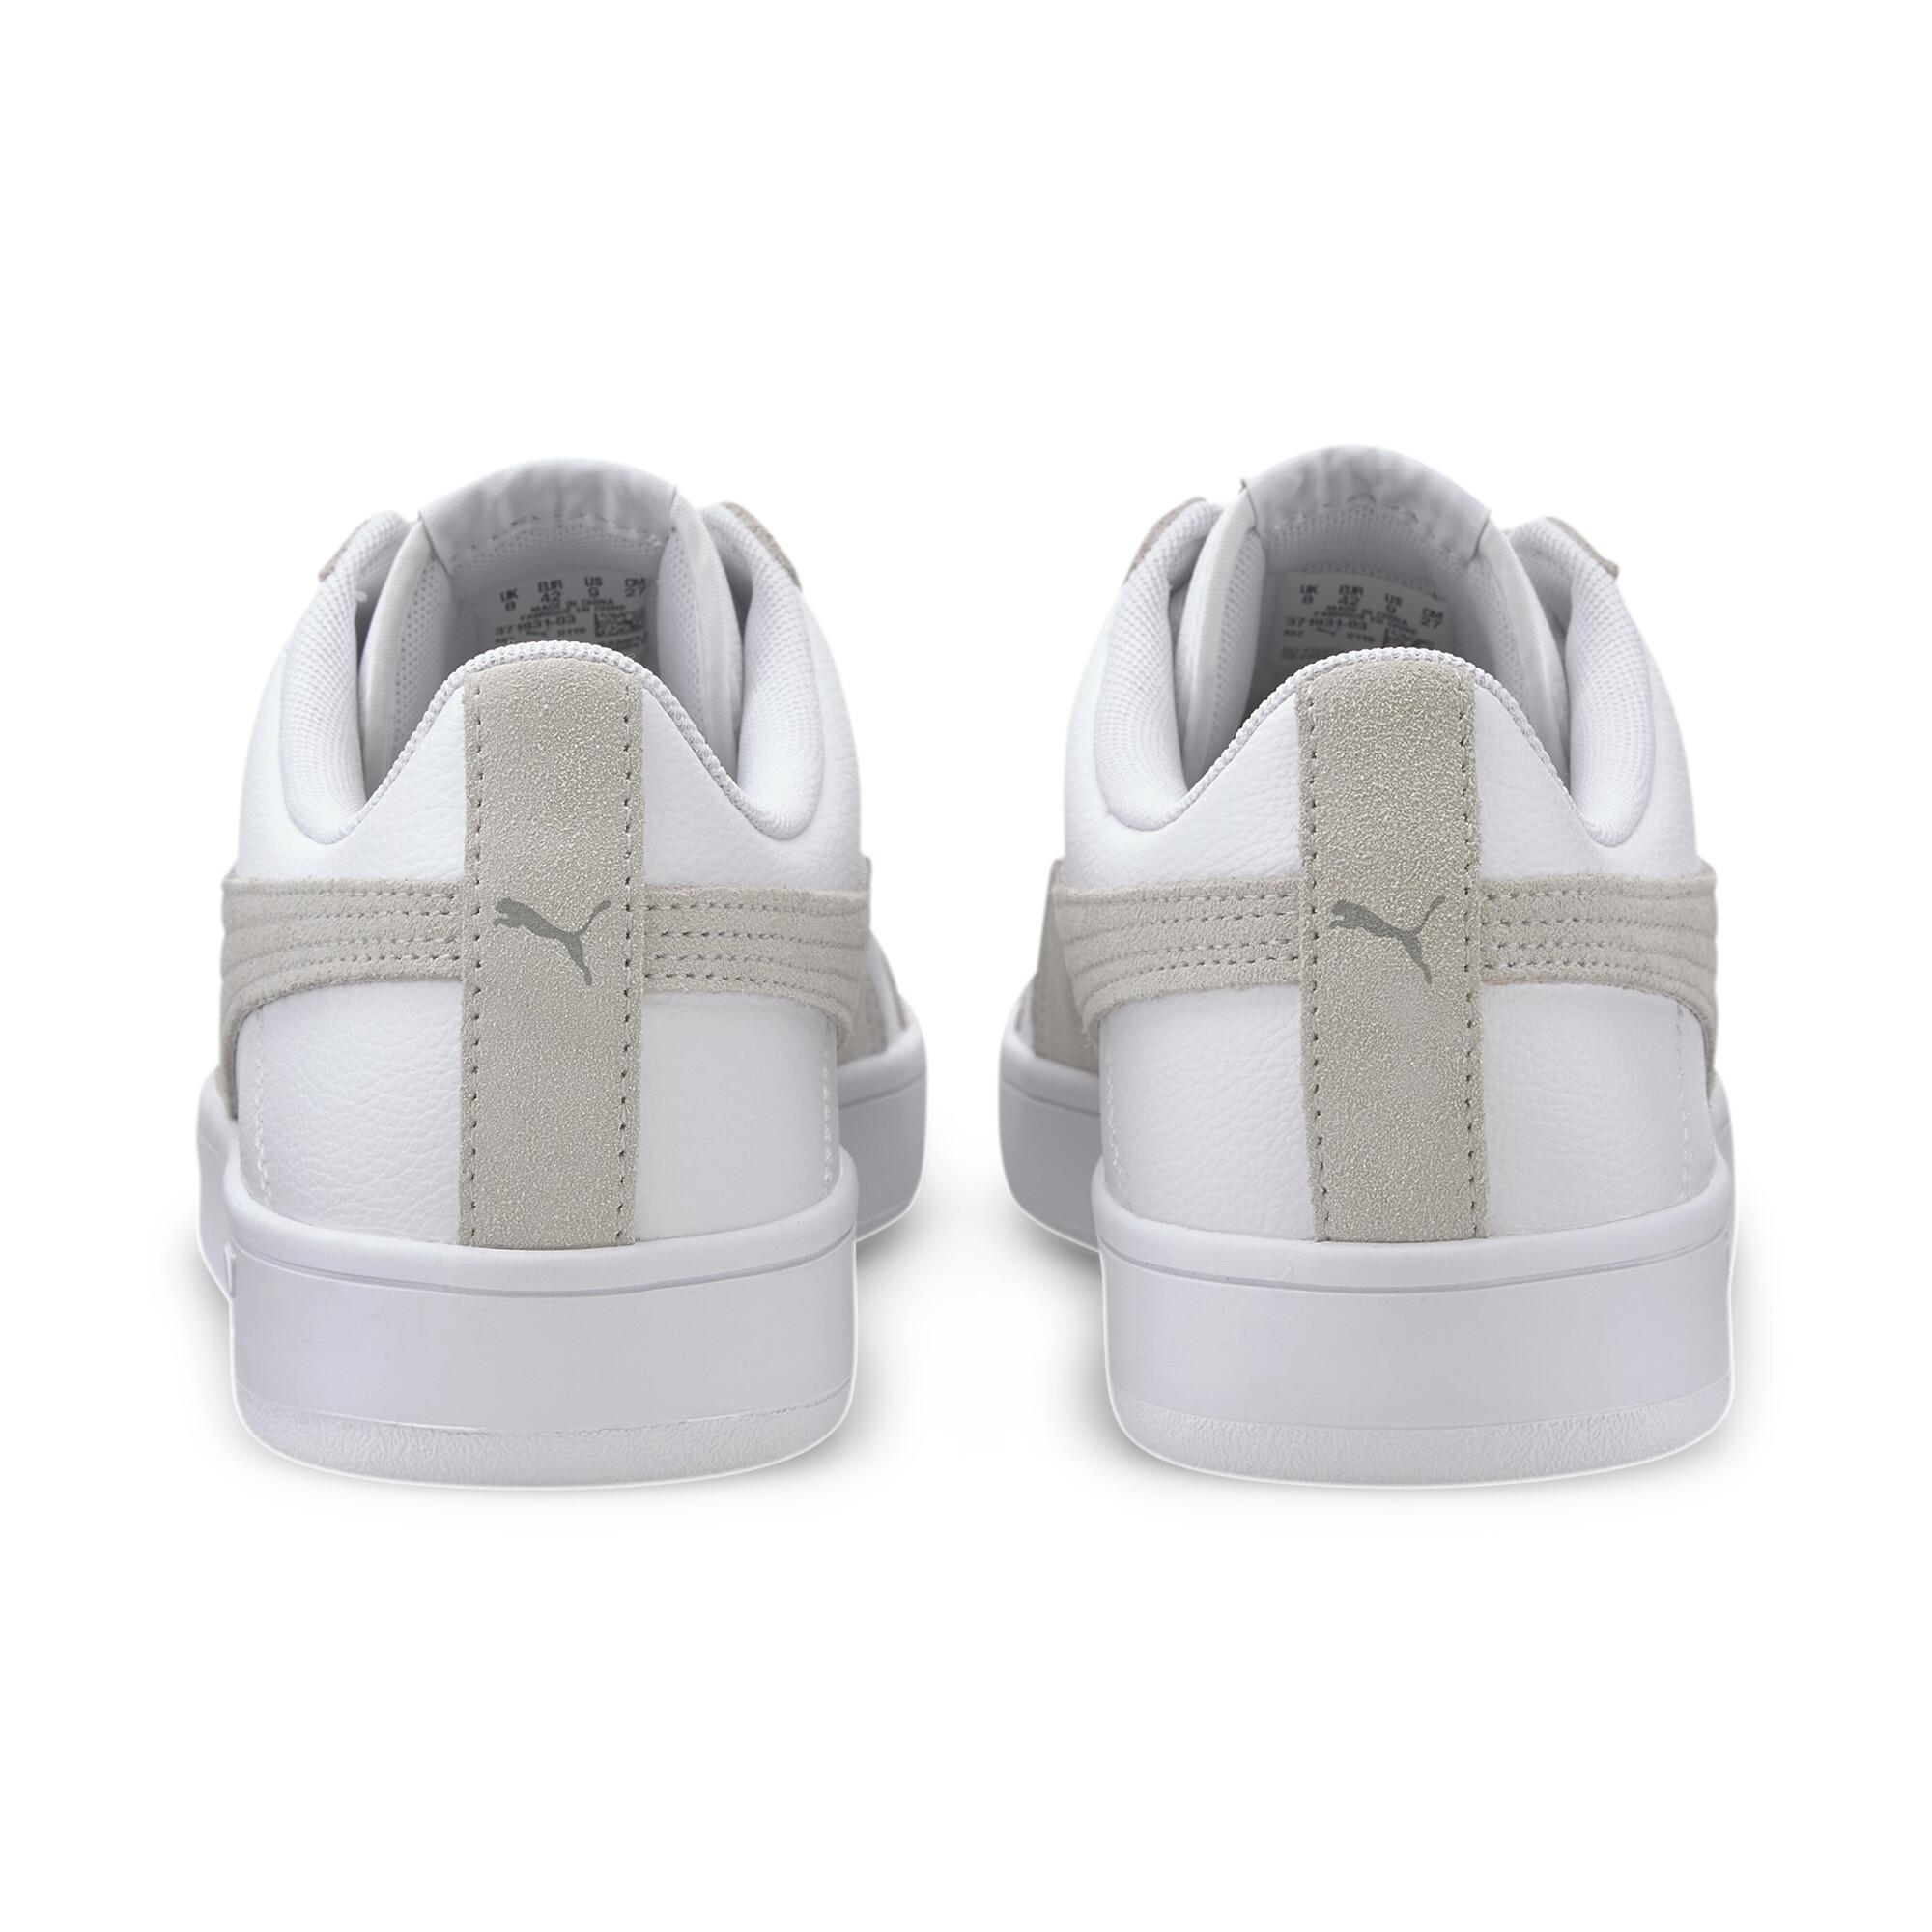 Indexbild 3 - PUMA Court Legend Lo Sneaker Unisex Schuhe Basics Neu